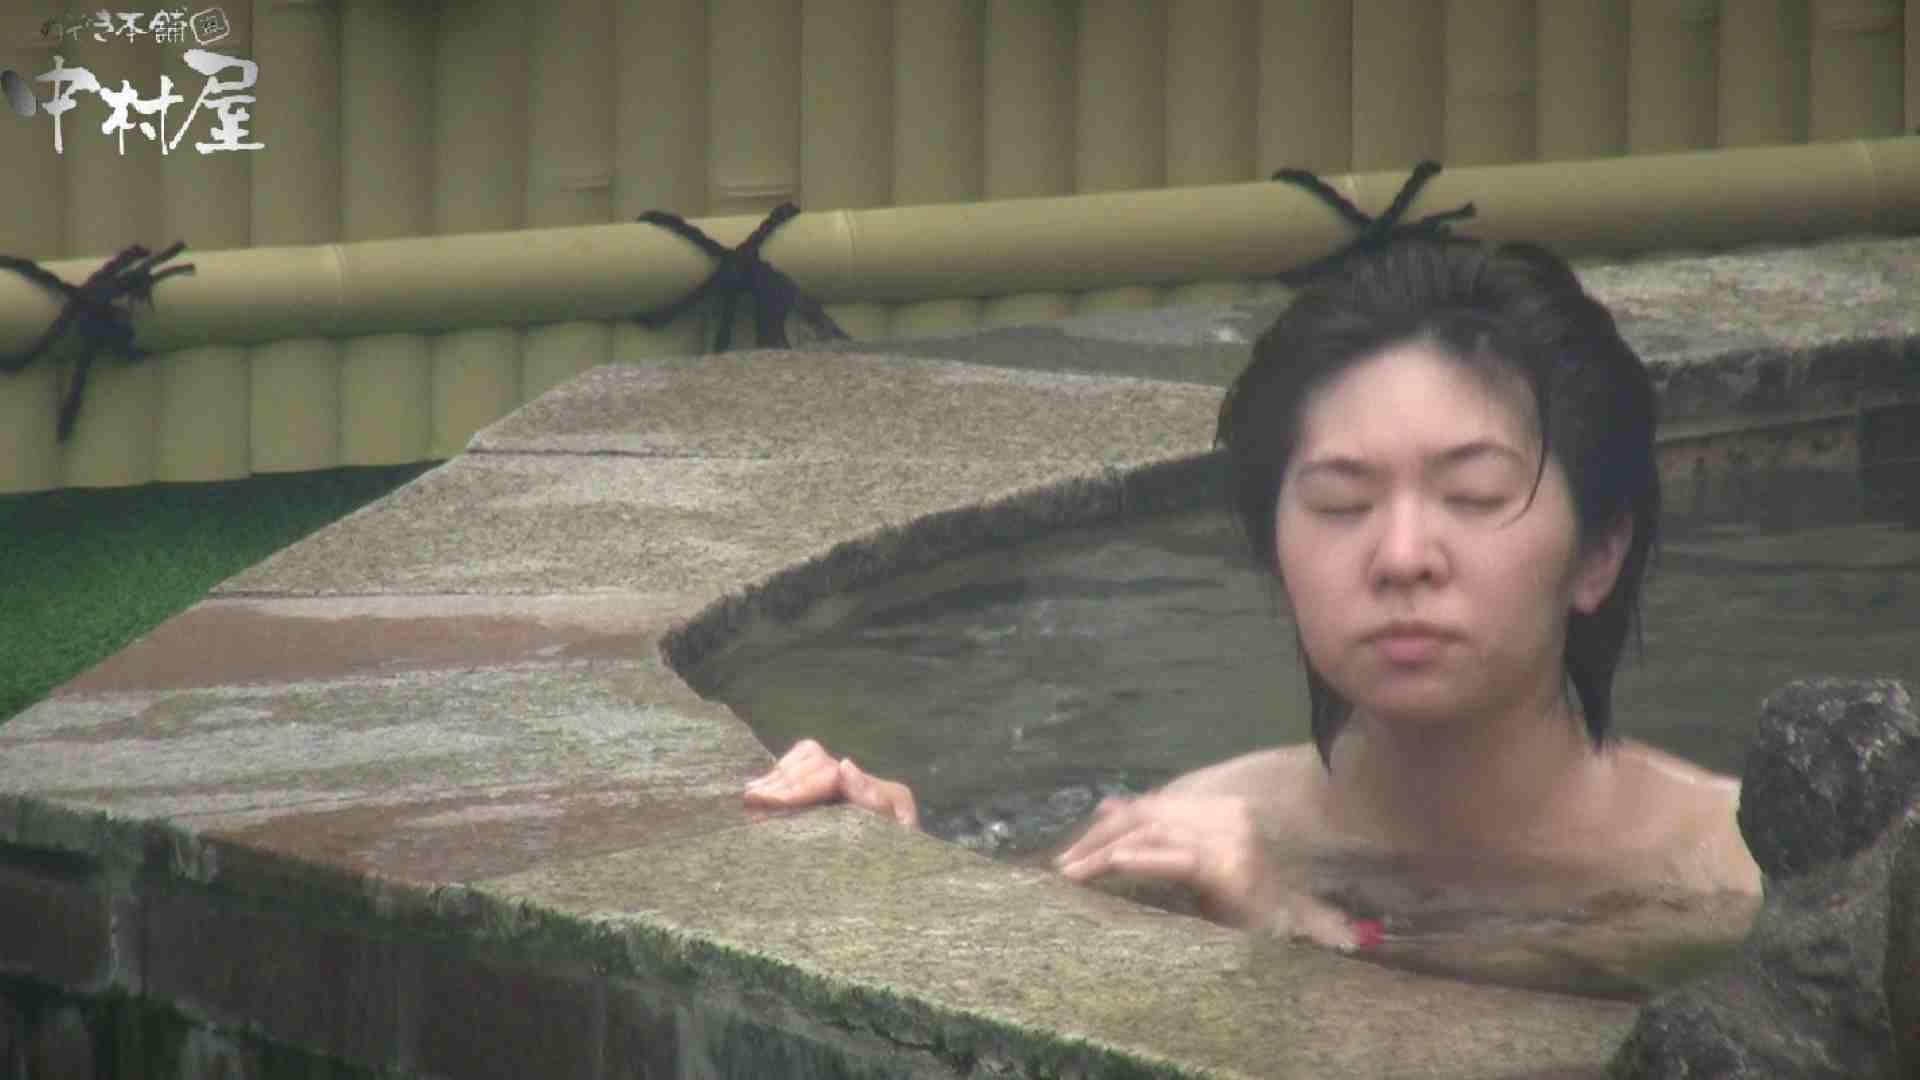 Aquaな露天風呂Vol.907 盗撮師作品  70pic 3